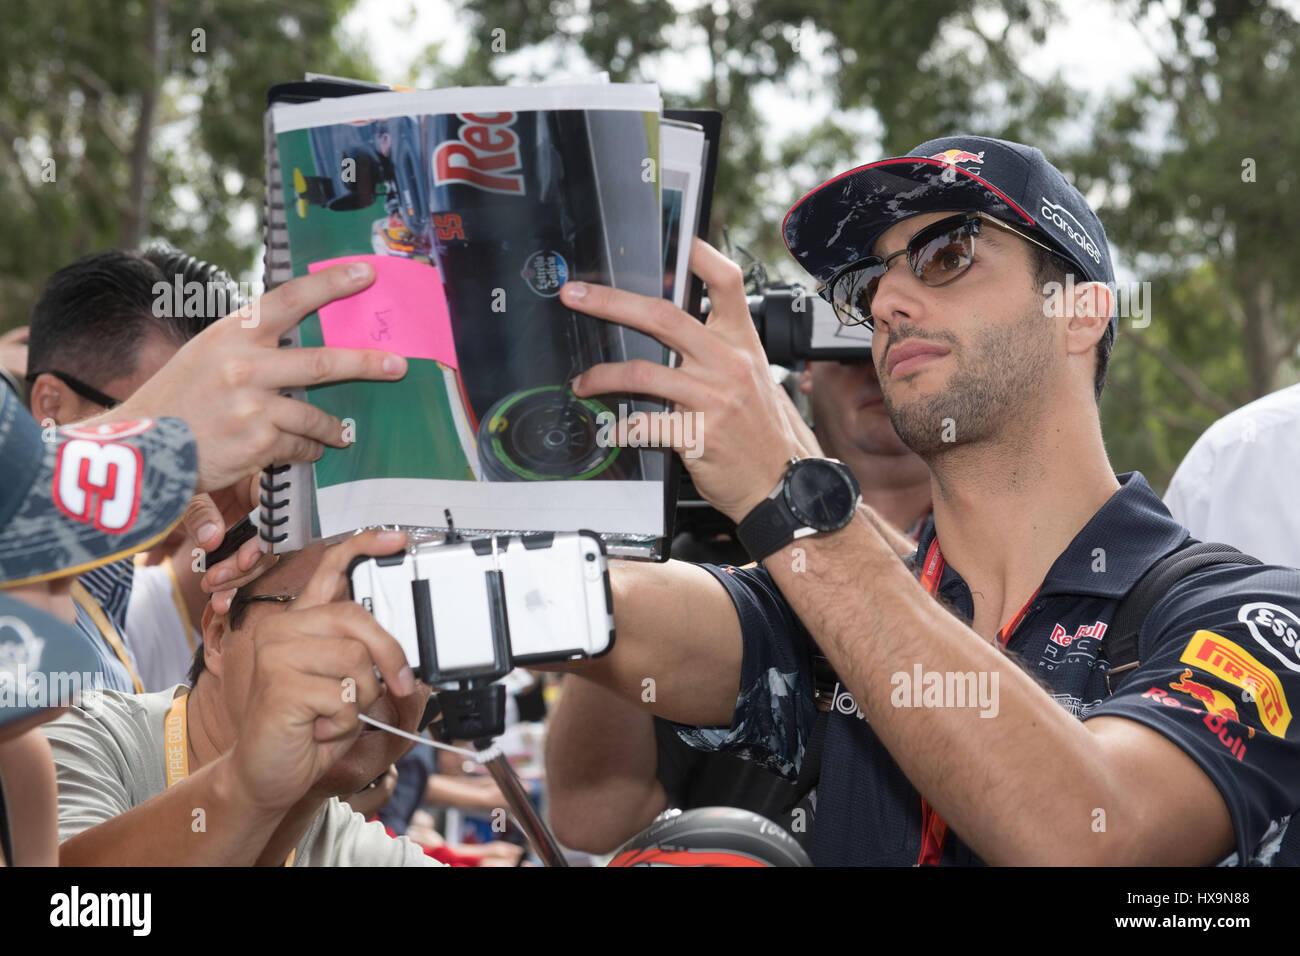 Melbourne, Australien. 26. März 2017. Red Bull Racing Formel1 Fahrer Daniel Ricciardo Australien Zeichen Autogramme Stockfoto